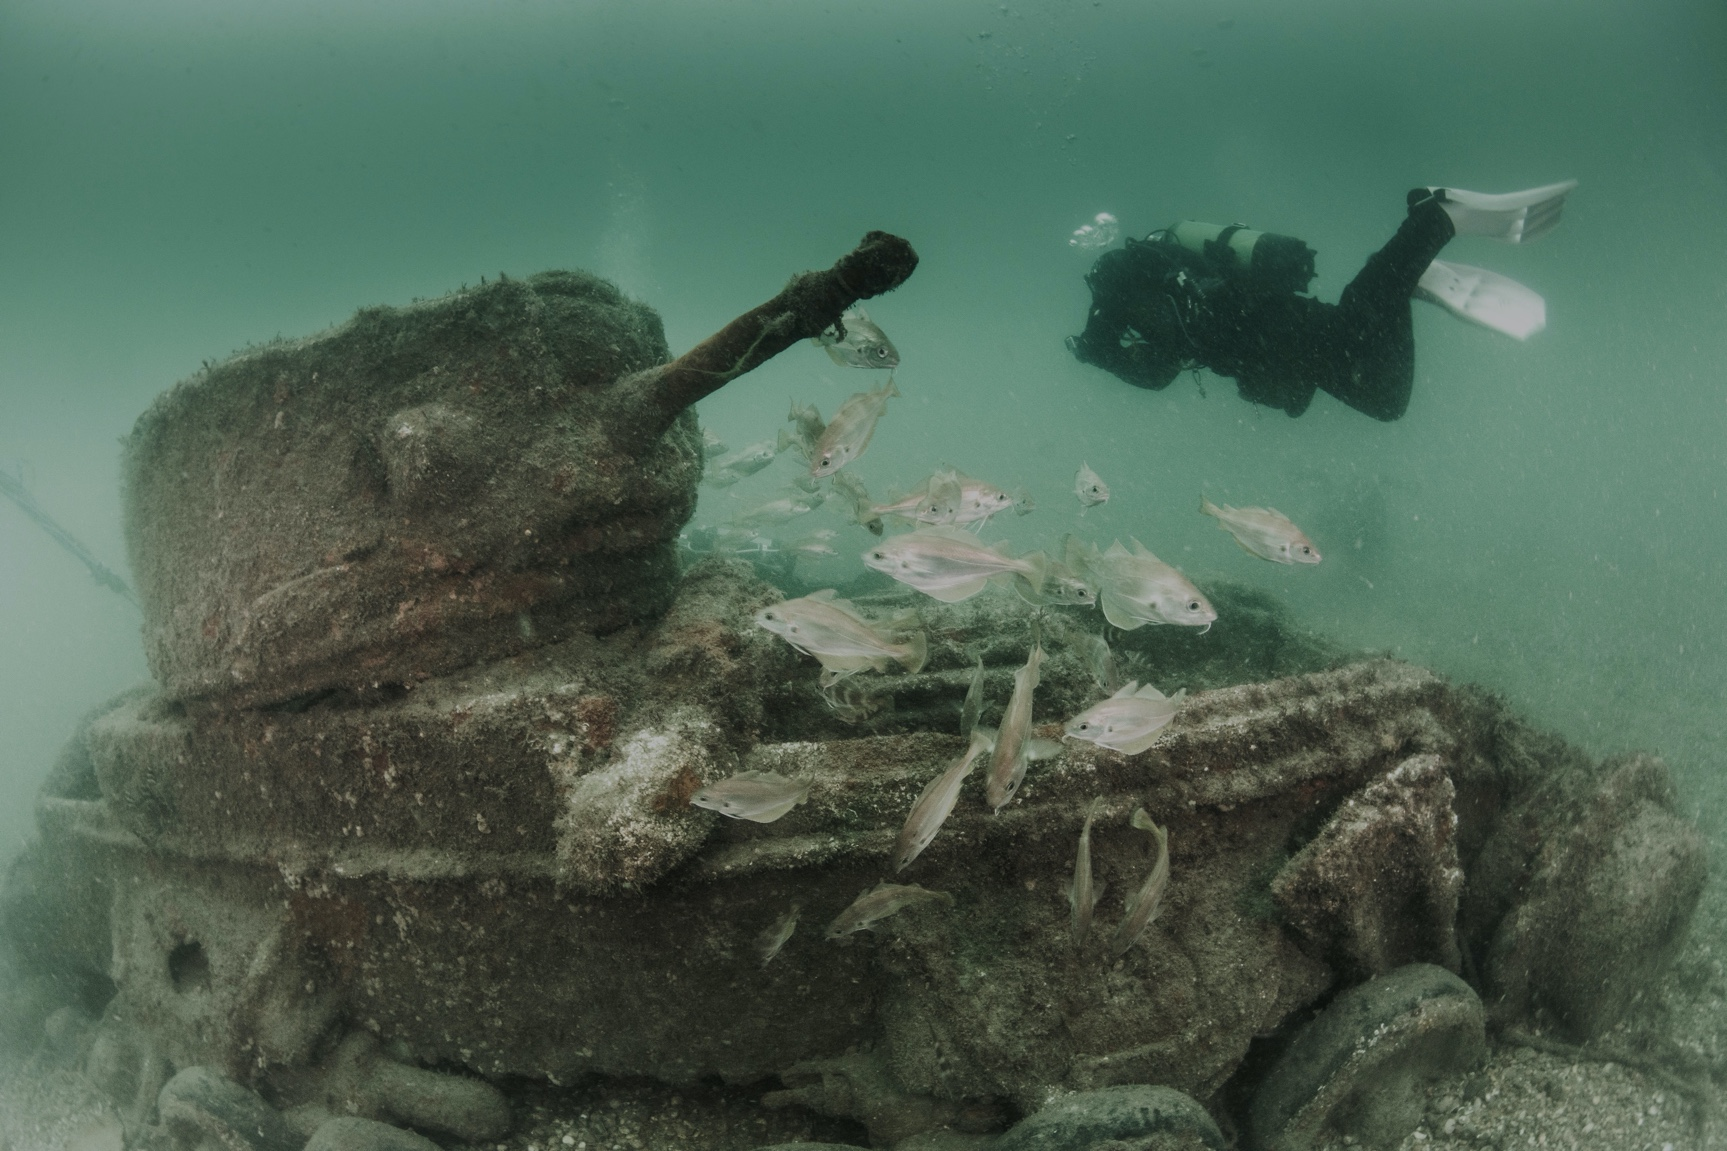 2017, Wessex Archaeology, Blyth NaREC Offshore Demonstration Site, Archaeological Assessment of Gardline 2016 Geophysical Data